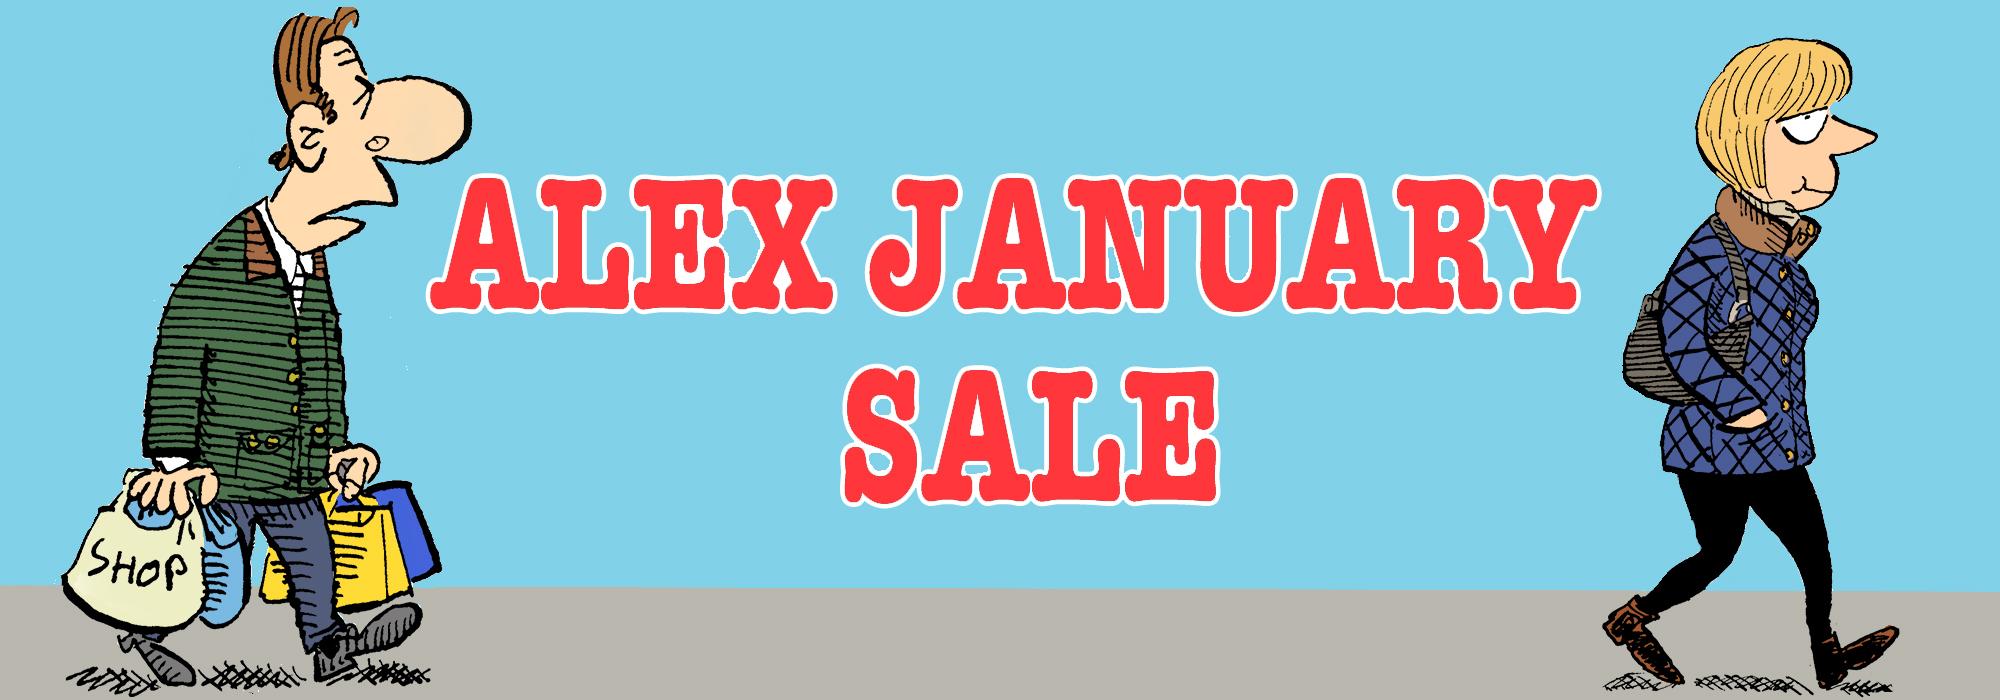 Alex January Sale